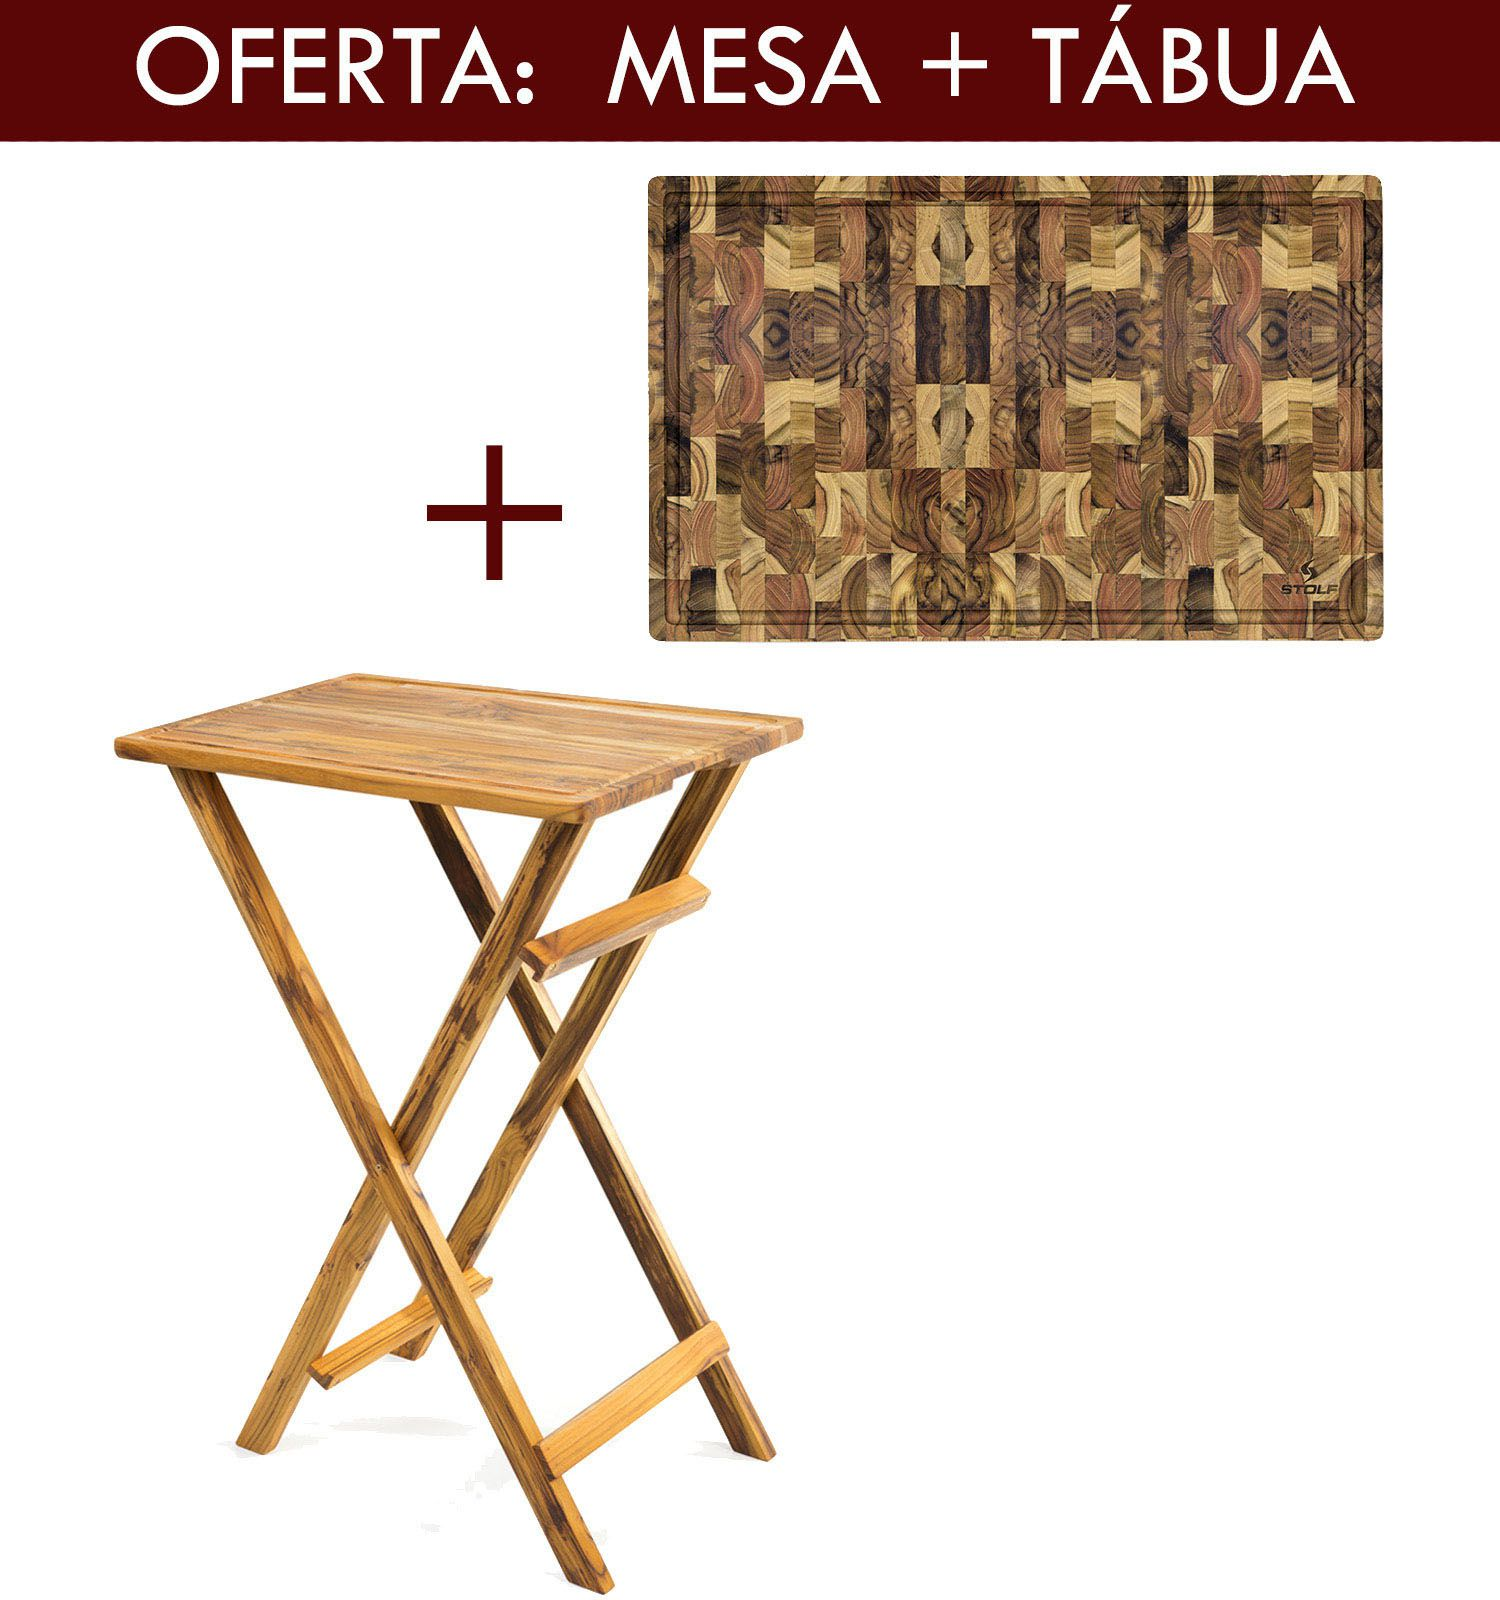 Mesa de Madeira Para Churrasco + Tabua de Carne Personalizados